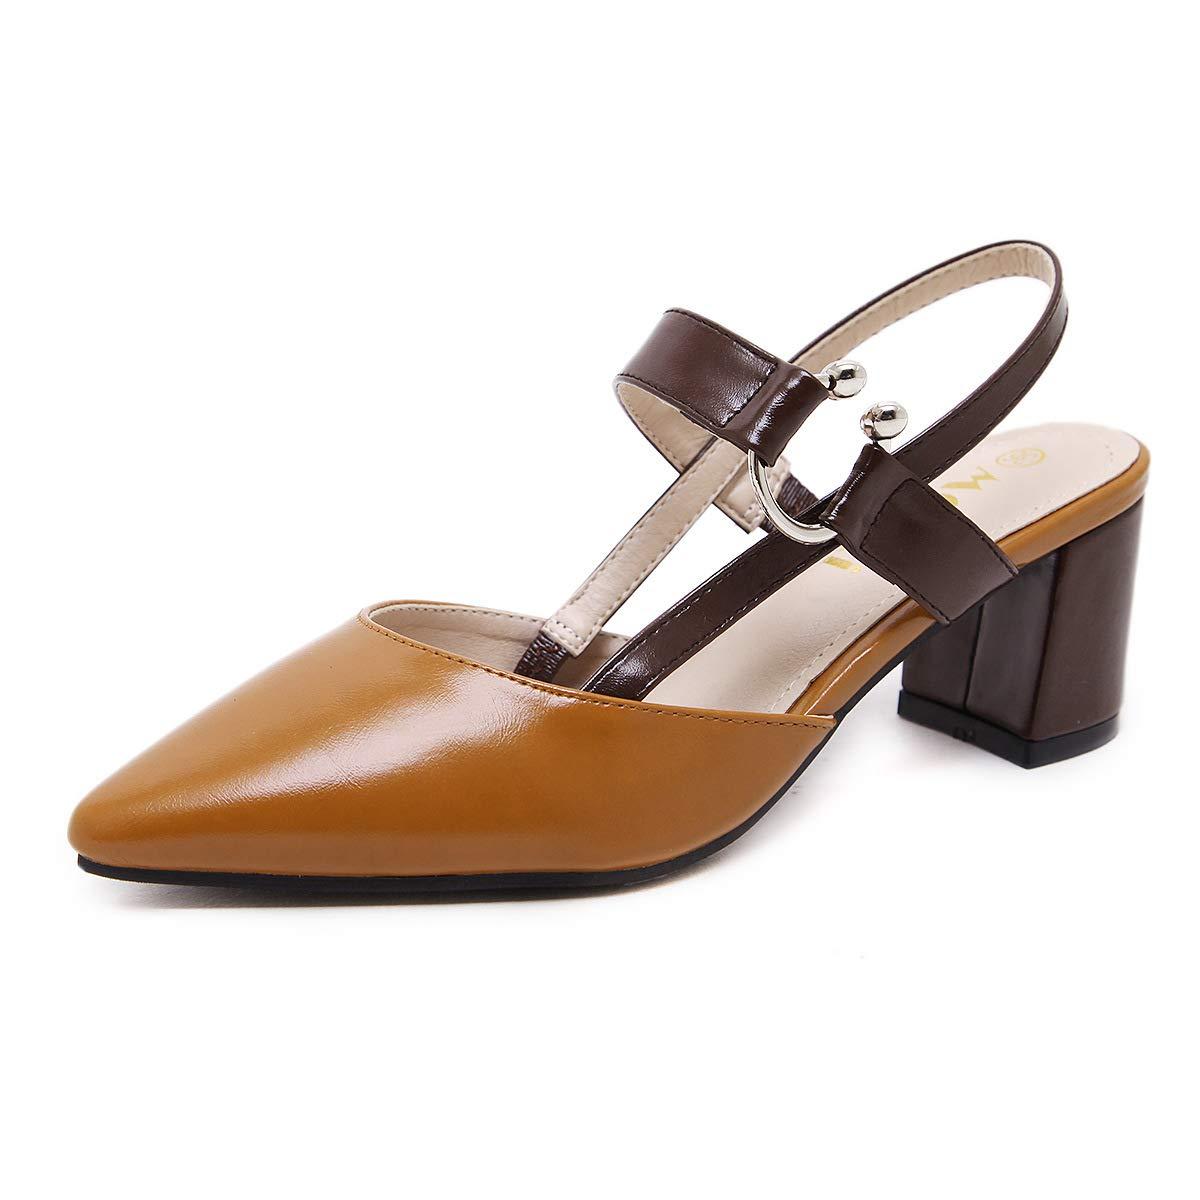 HRCxue Pumps Damenschuhe mit High Schnalle, Heels, Rückensandalen, Schnalle, High dick mit Spitzen Schuhen, Damenschuhe, 39, braun 7f04c6